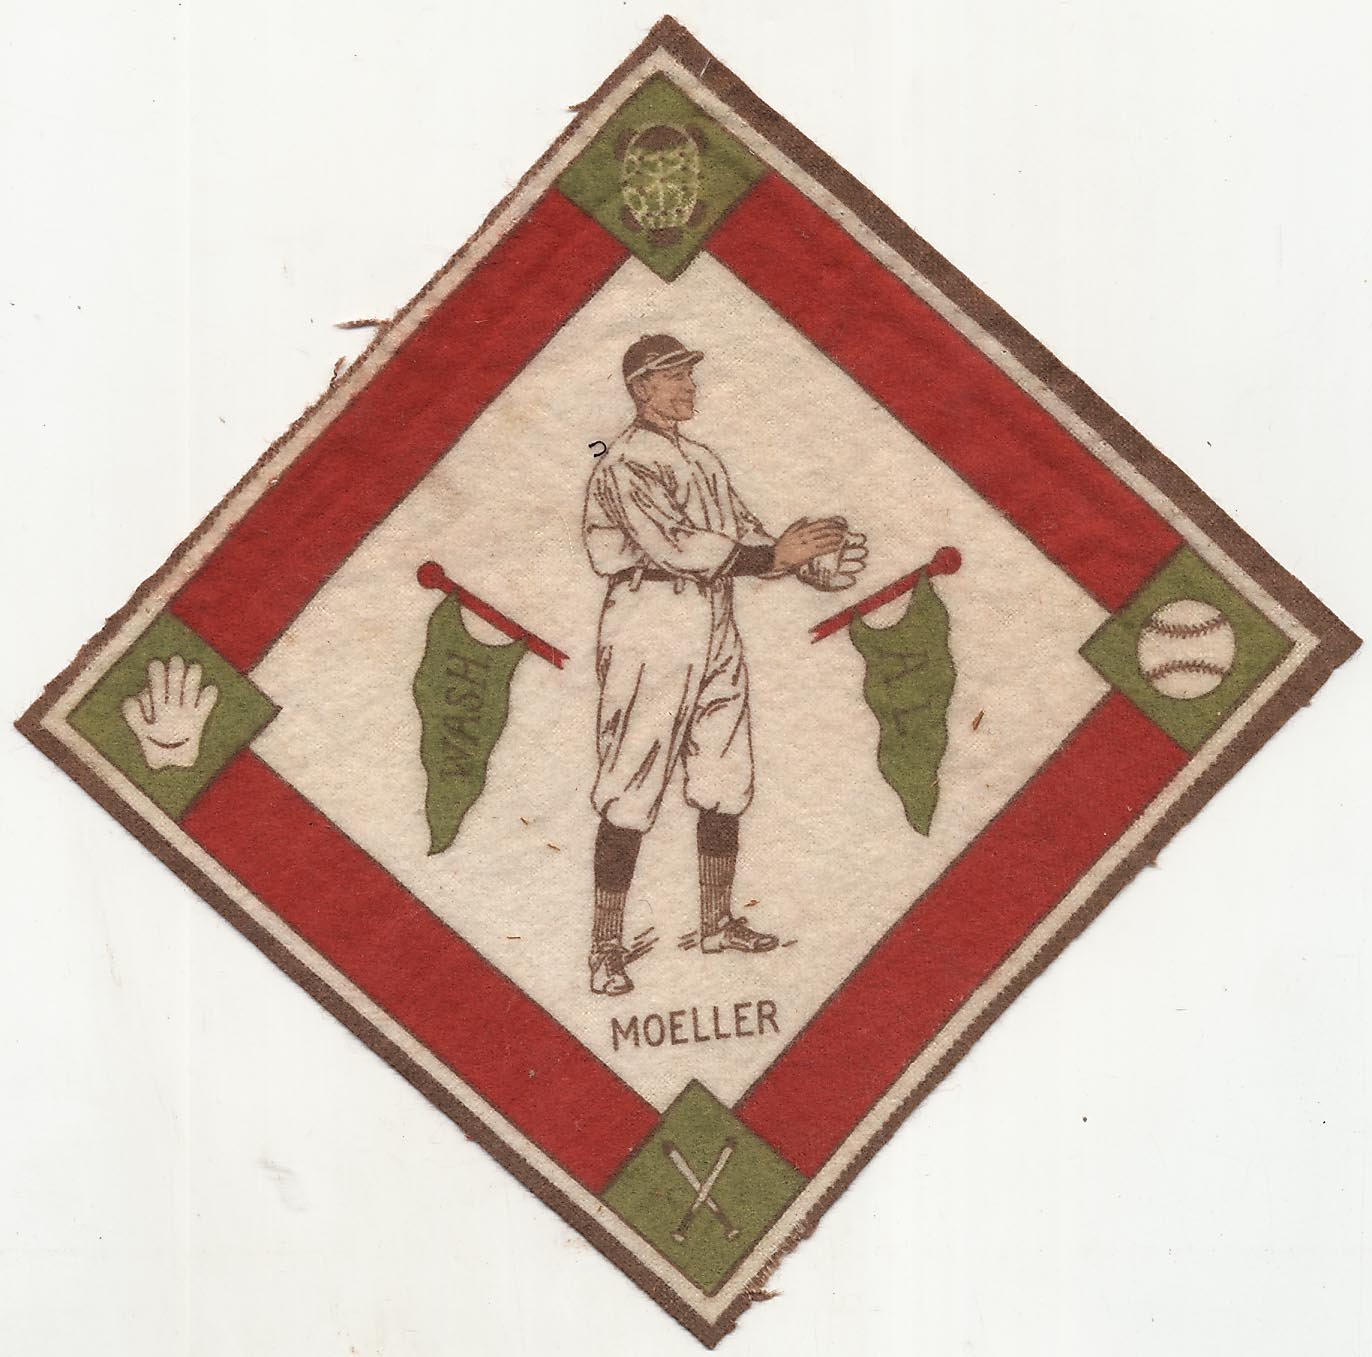 Lot #91 1914 B18 Blanket # 56.2 Danny Moeller (green pennants) Cond: Ex